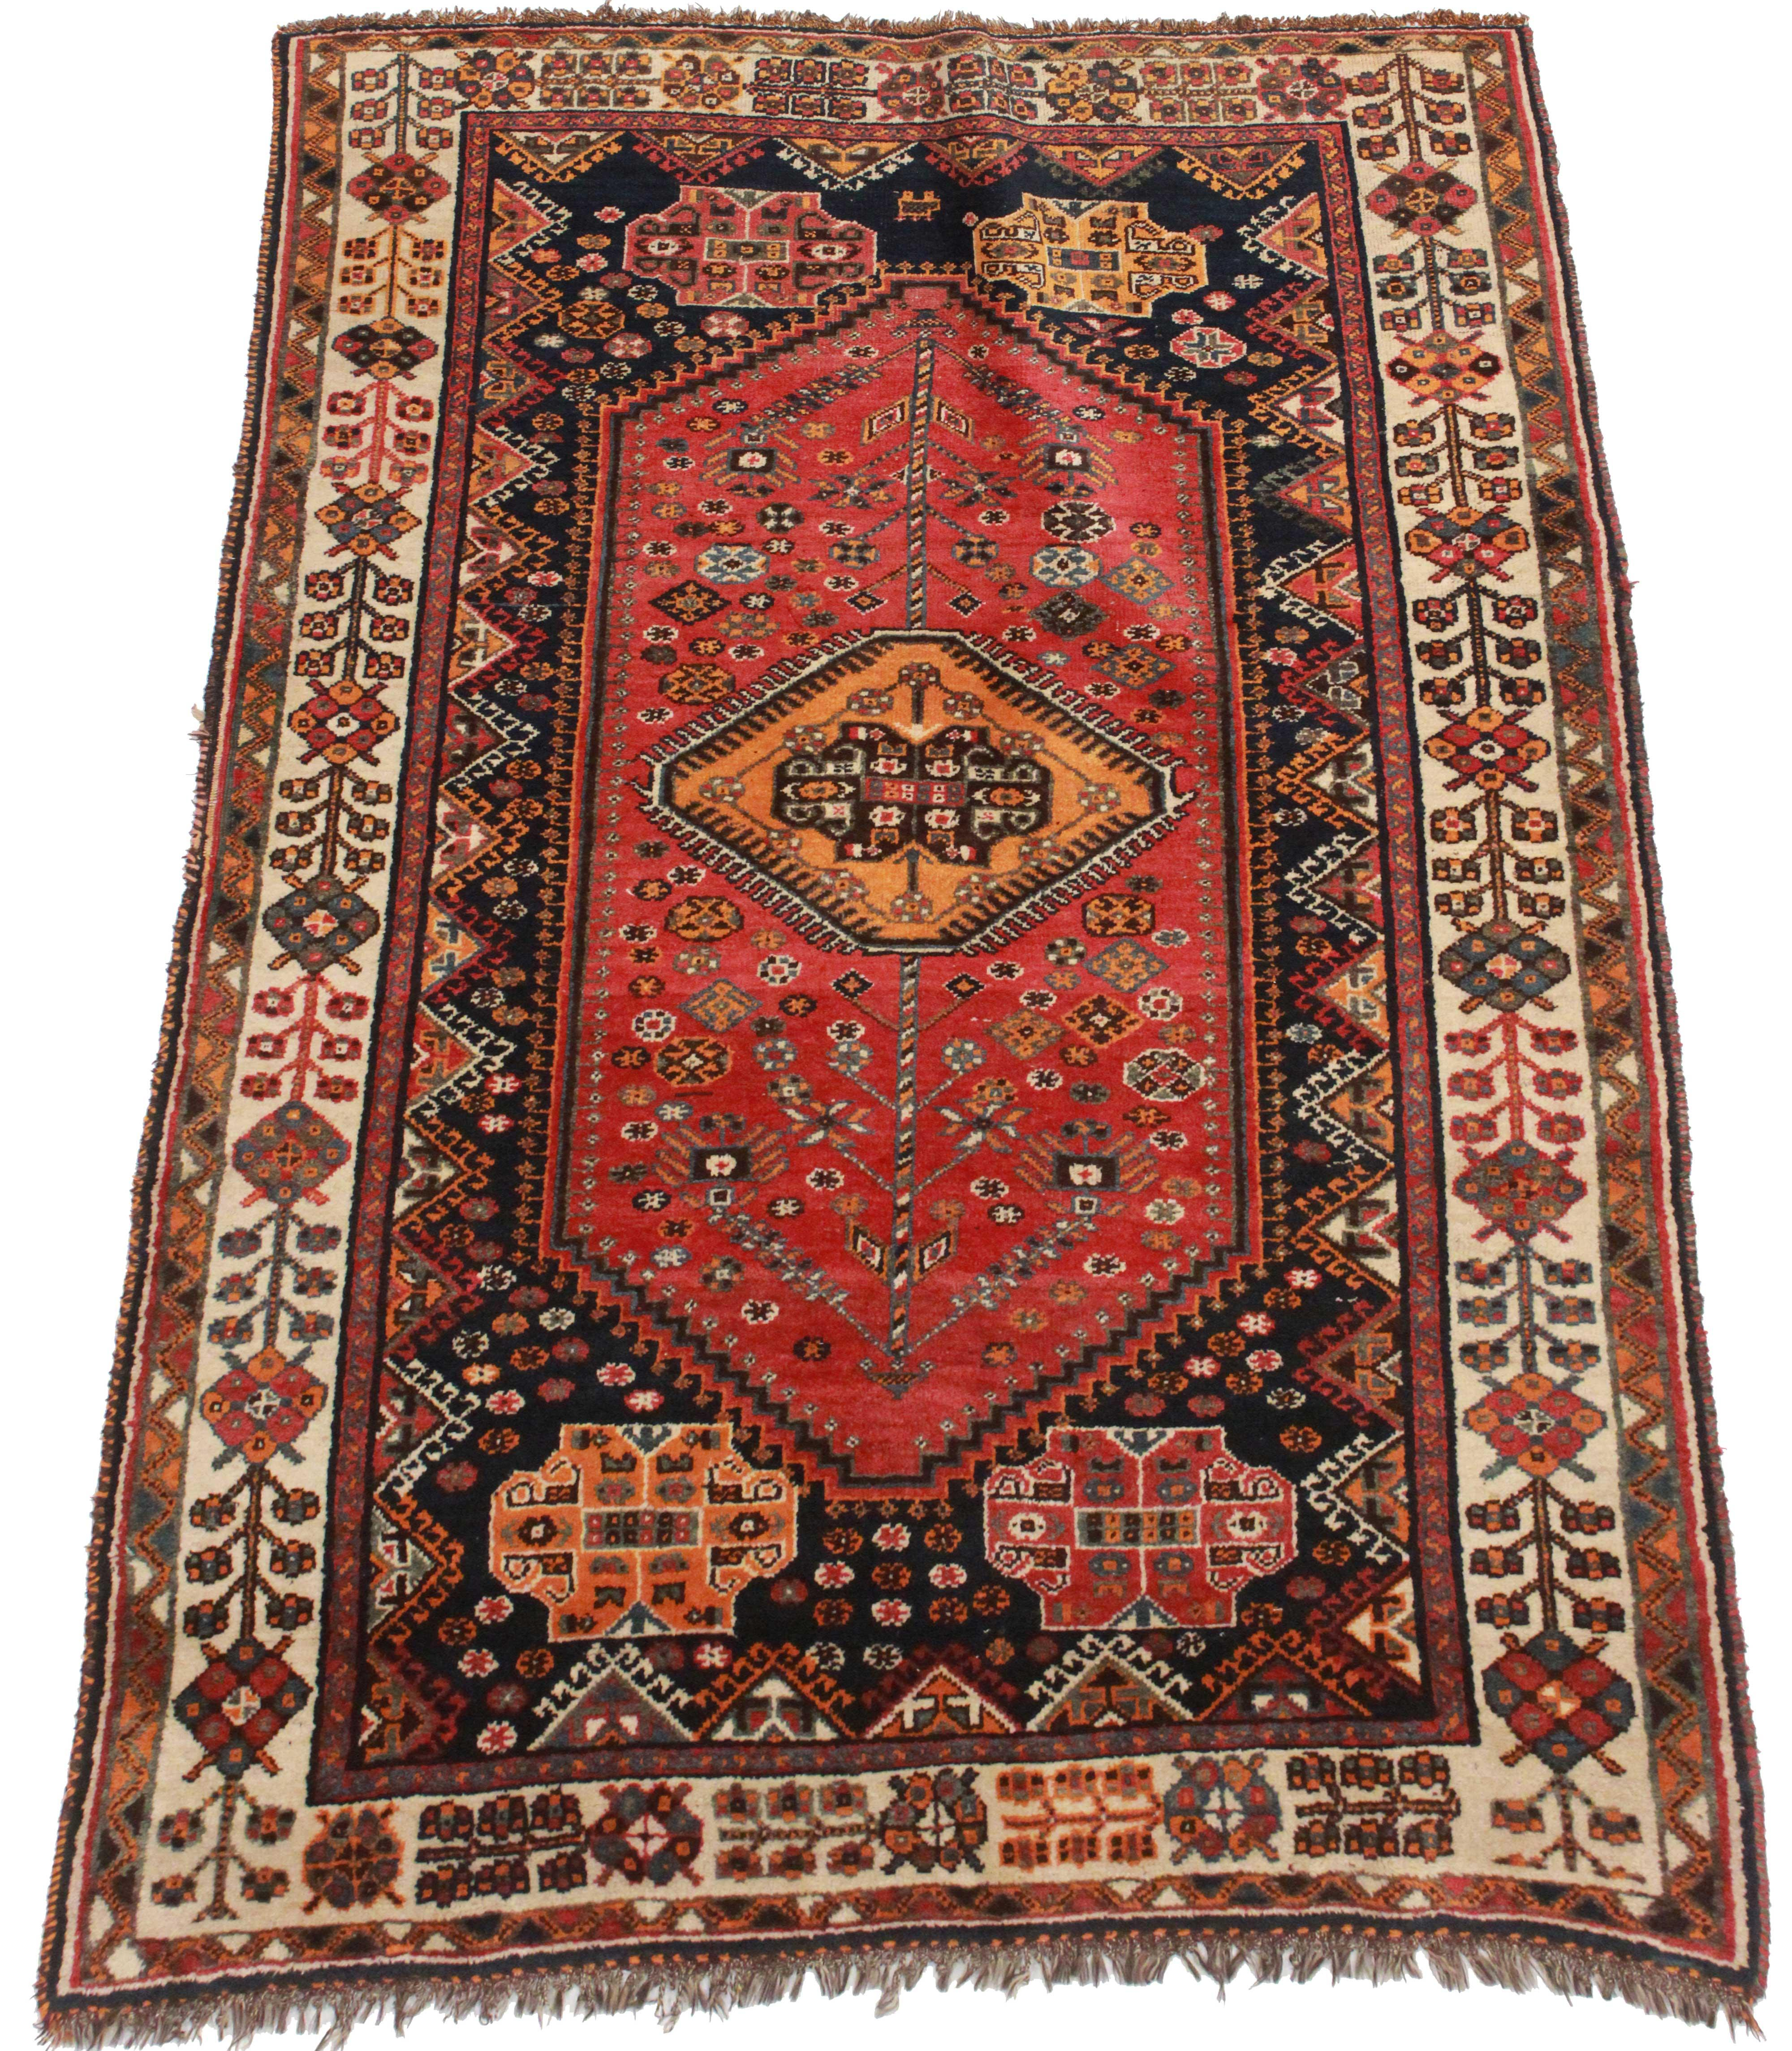 Rugsindallas Persian Shiraz Hand Knotted Wool Rug 4 4 7 3